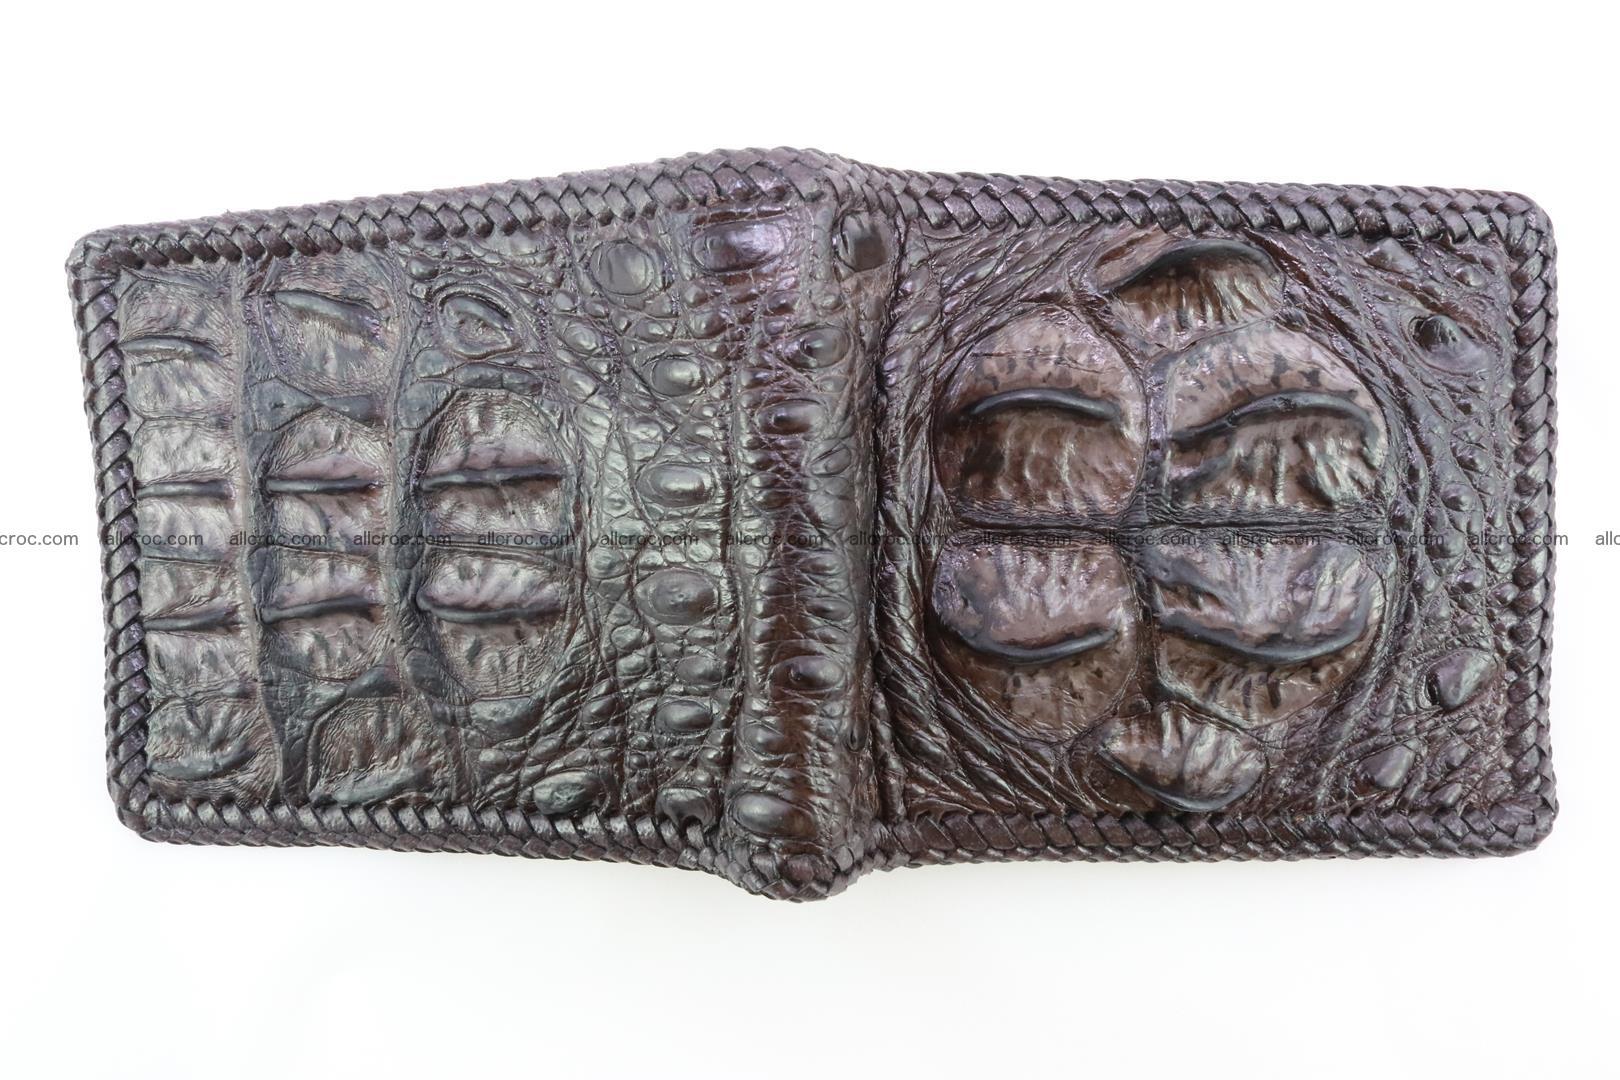 Genuine crocodile hornback wallet 116 Foto 2